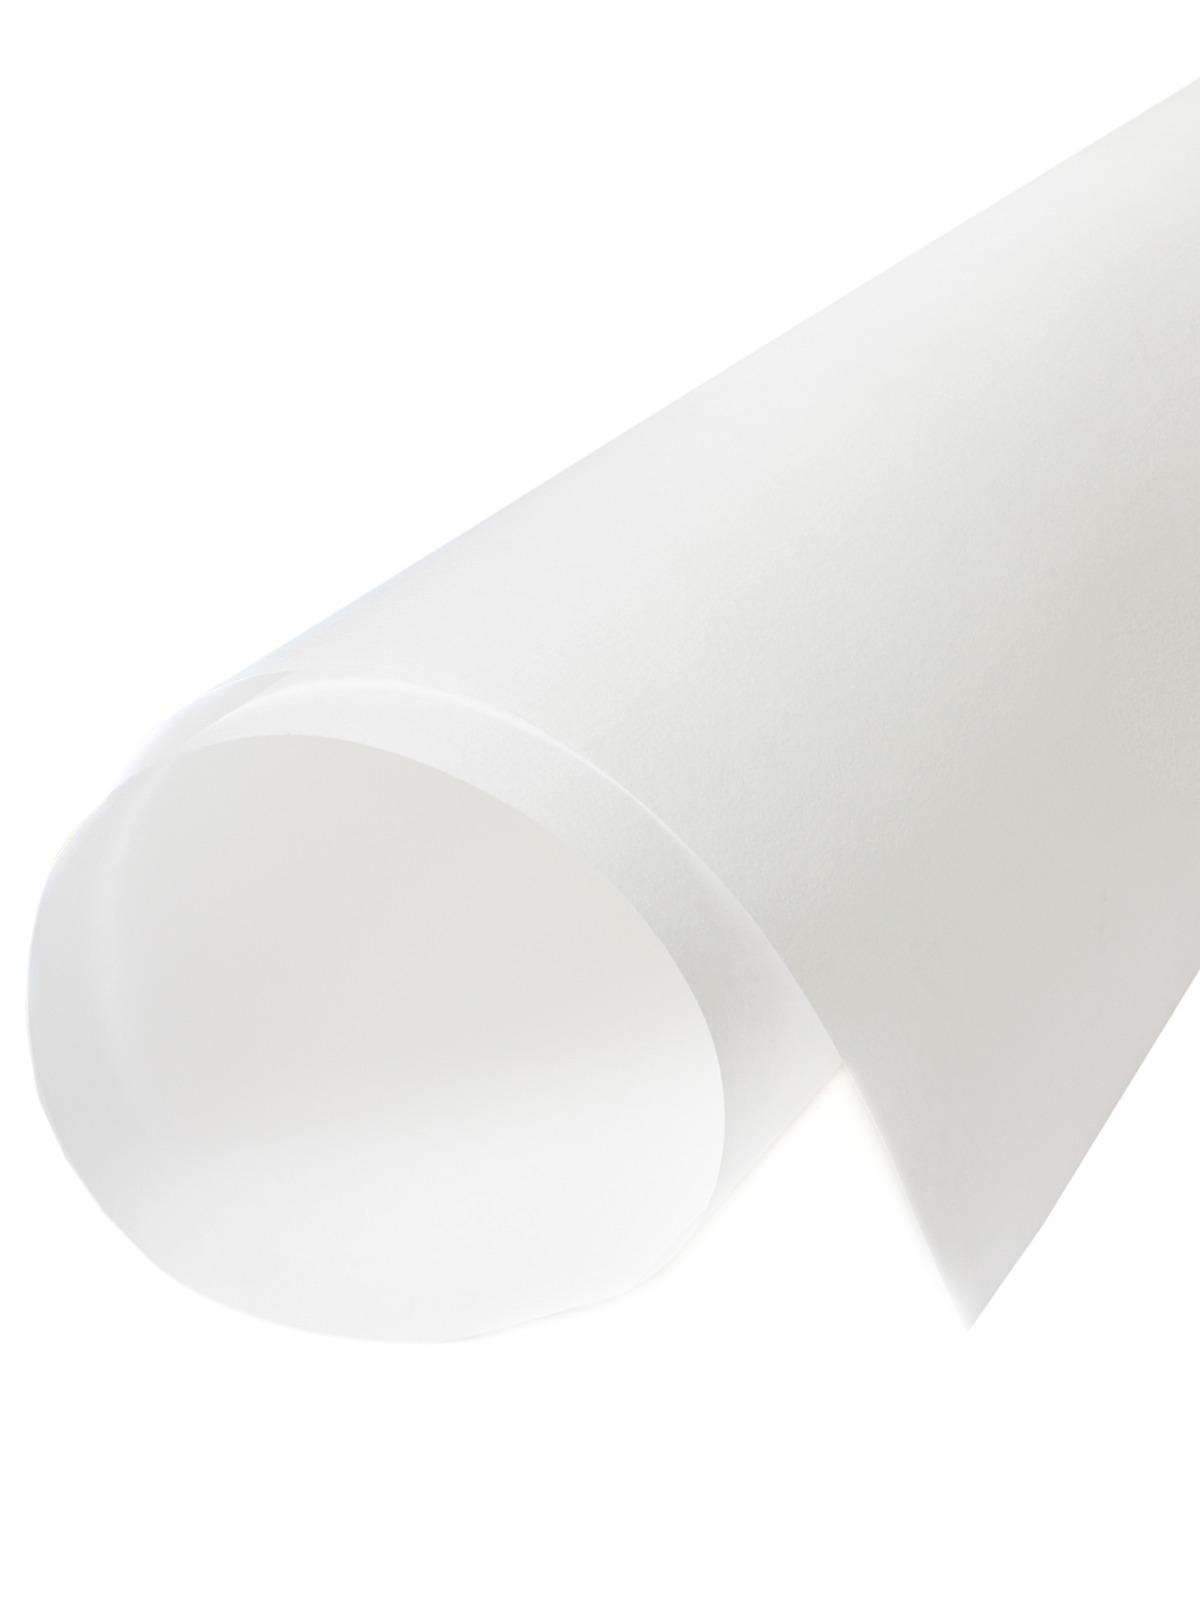 Masa Printmaking Paper